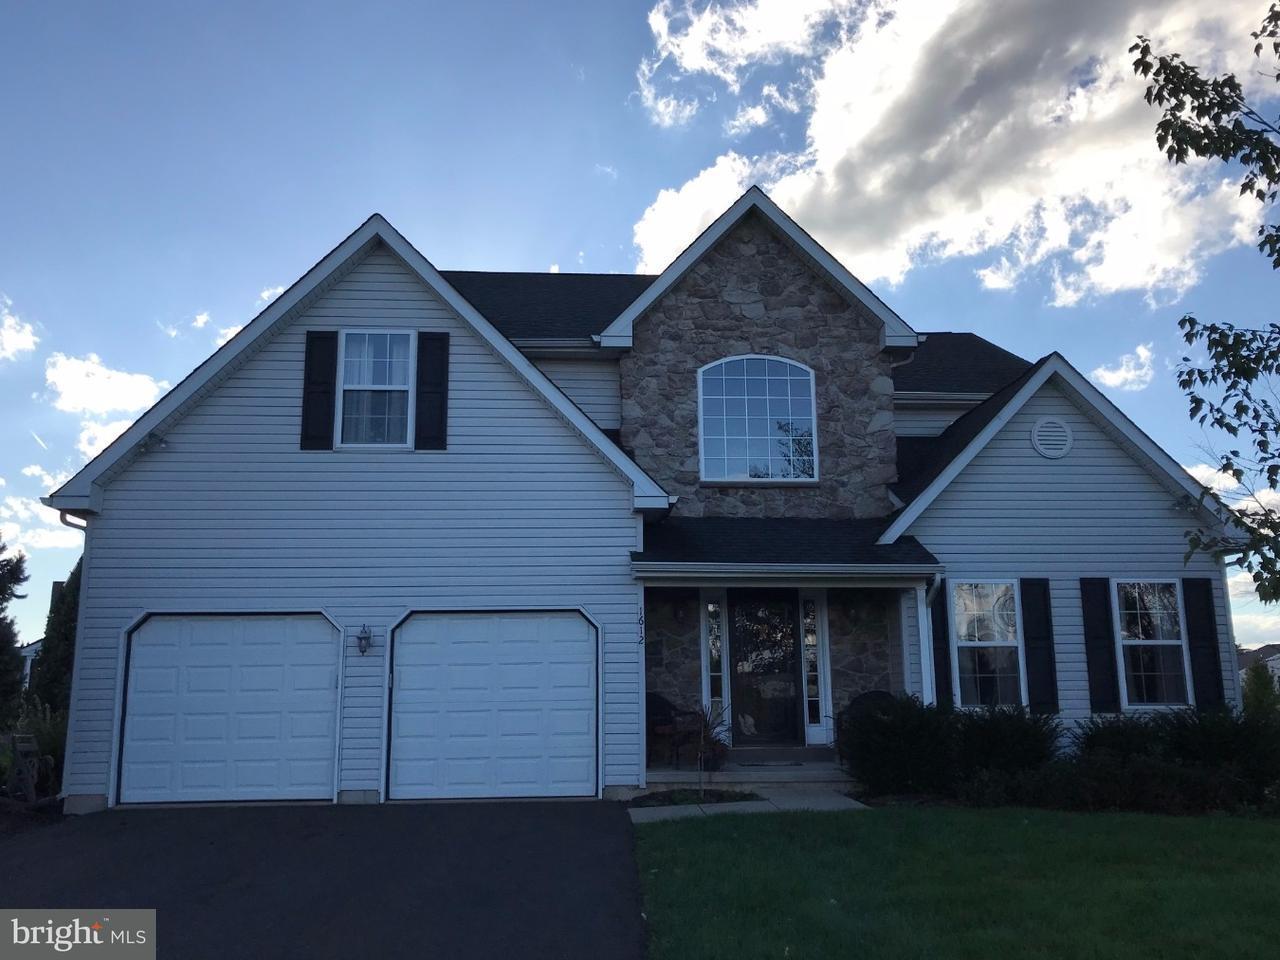 Single Family Home for Sale at 1612 HARTFORD Circle Souderton, Pennsylvania 18964 United States